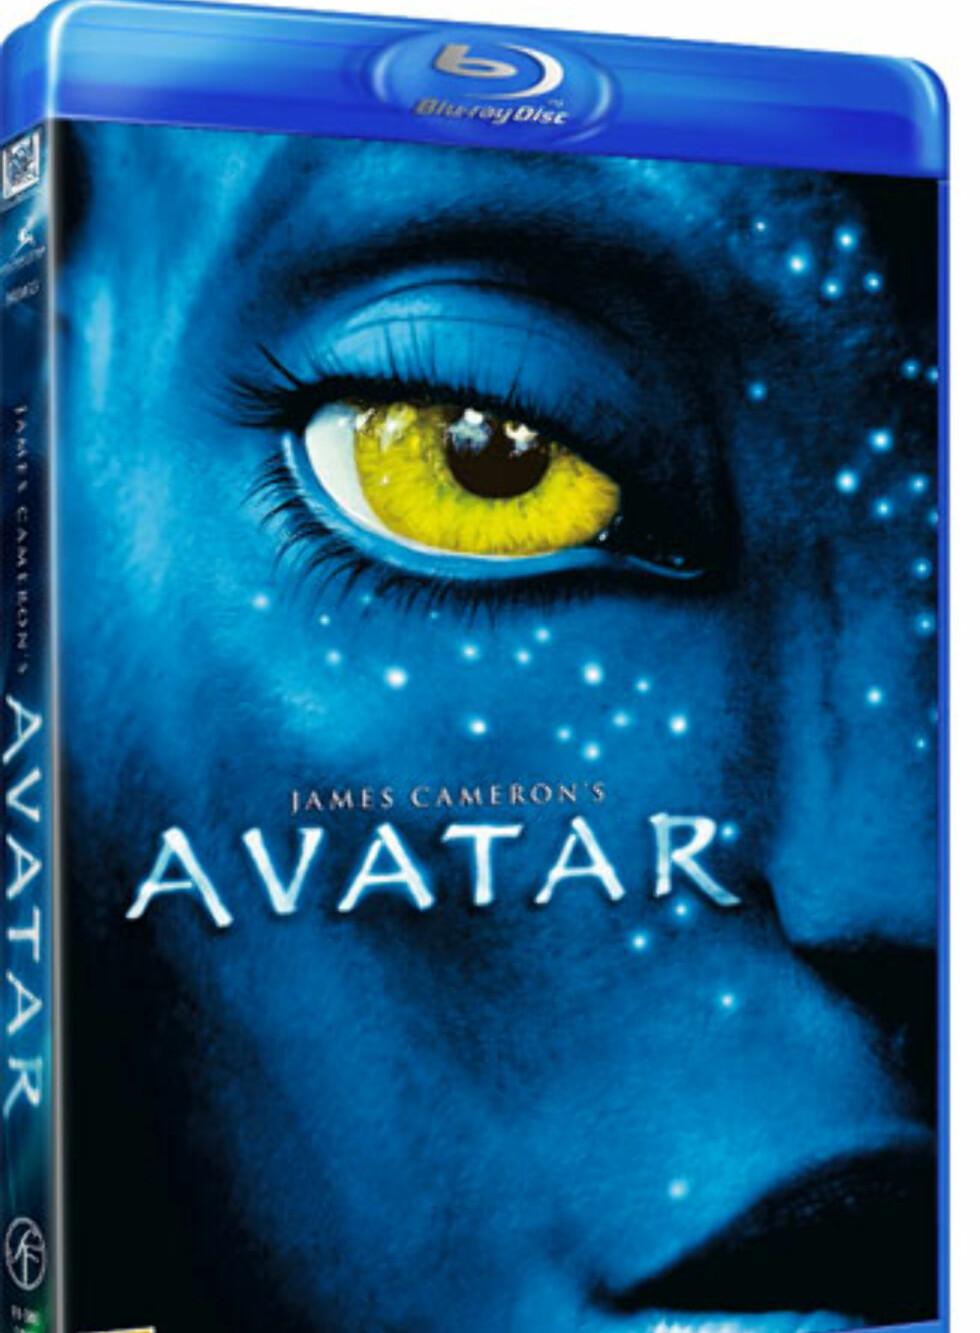 Blu-ray coveret Foto: Produktbilde/Copyright 20th Century Fox